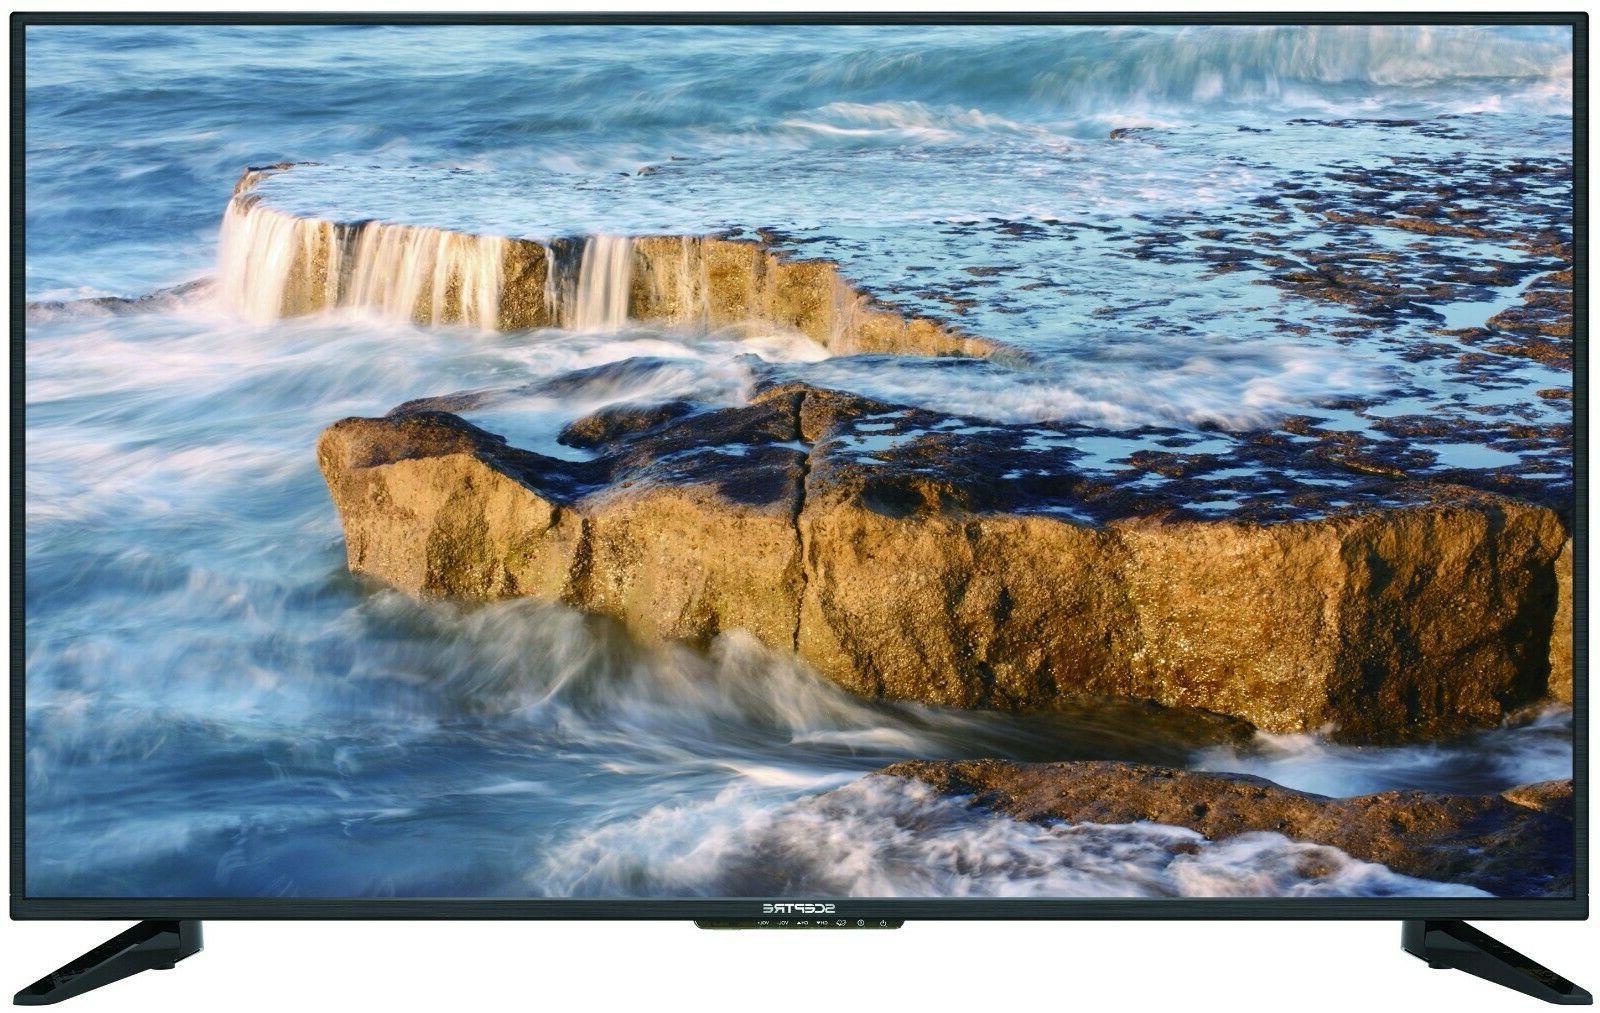 Sceptre 2160p LED TV